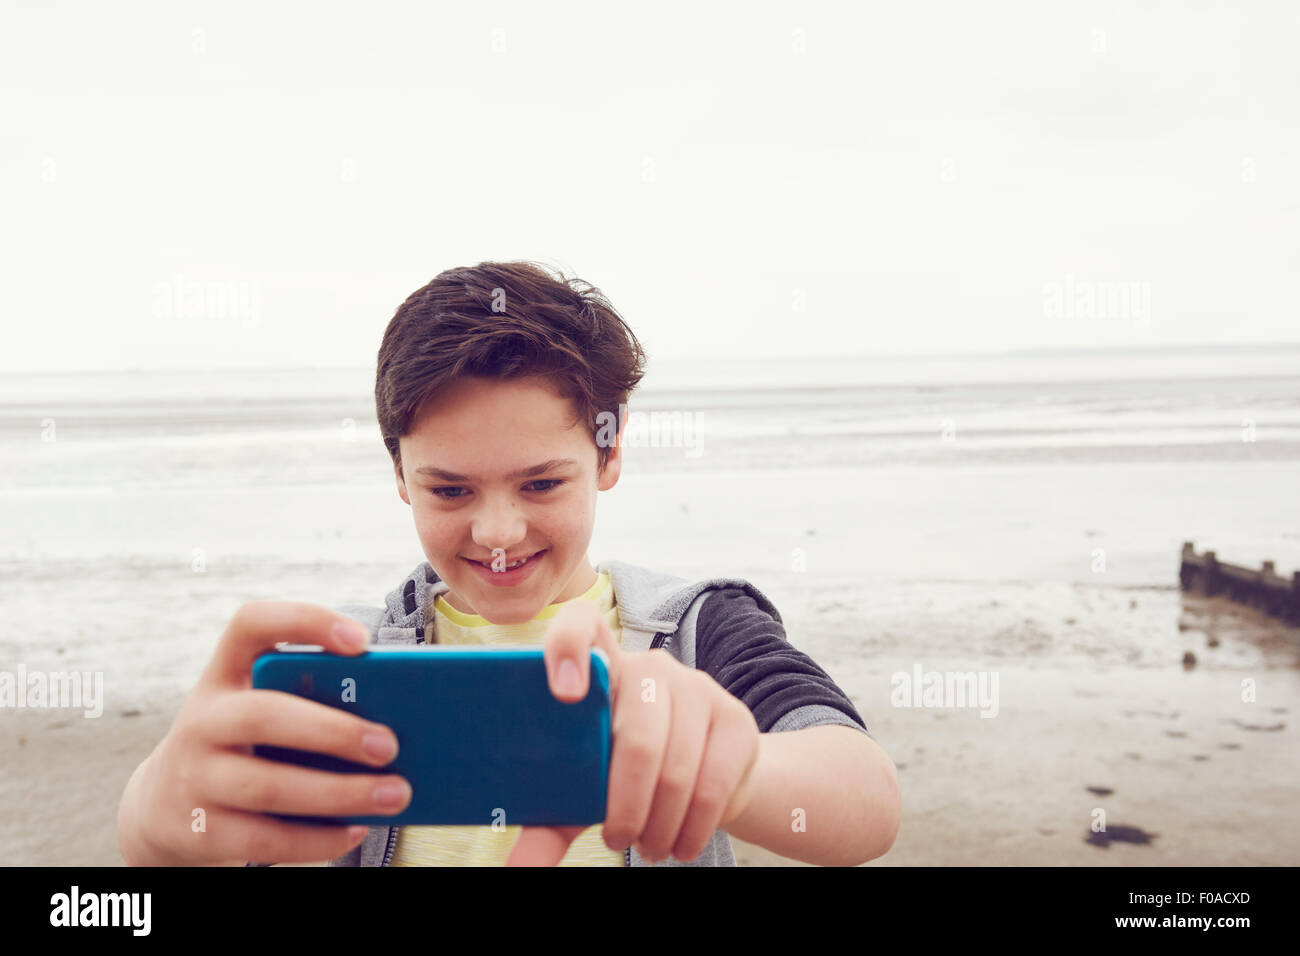 Smiling teenage boy taking smartphone selfie at seaside, Southend on Sea, Essex, UK - Stock Image